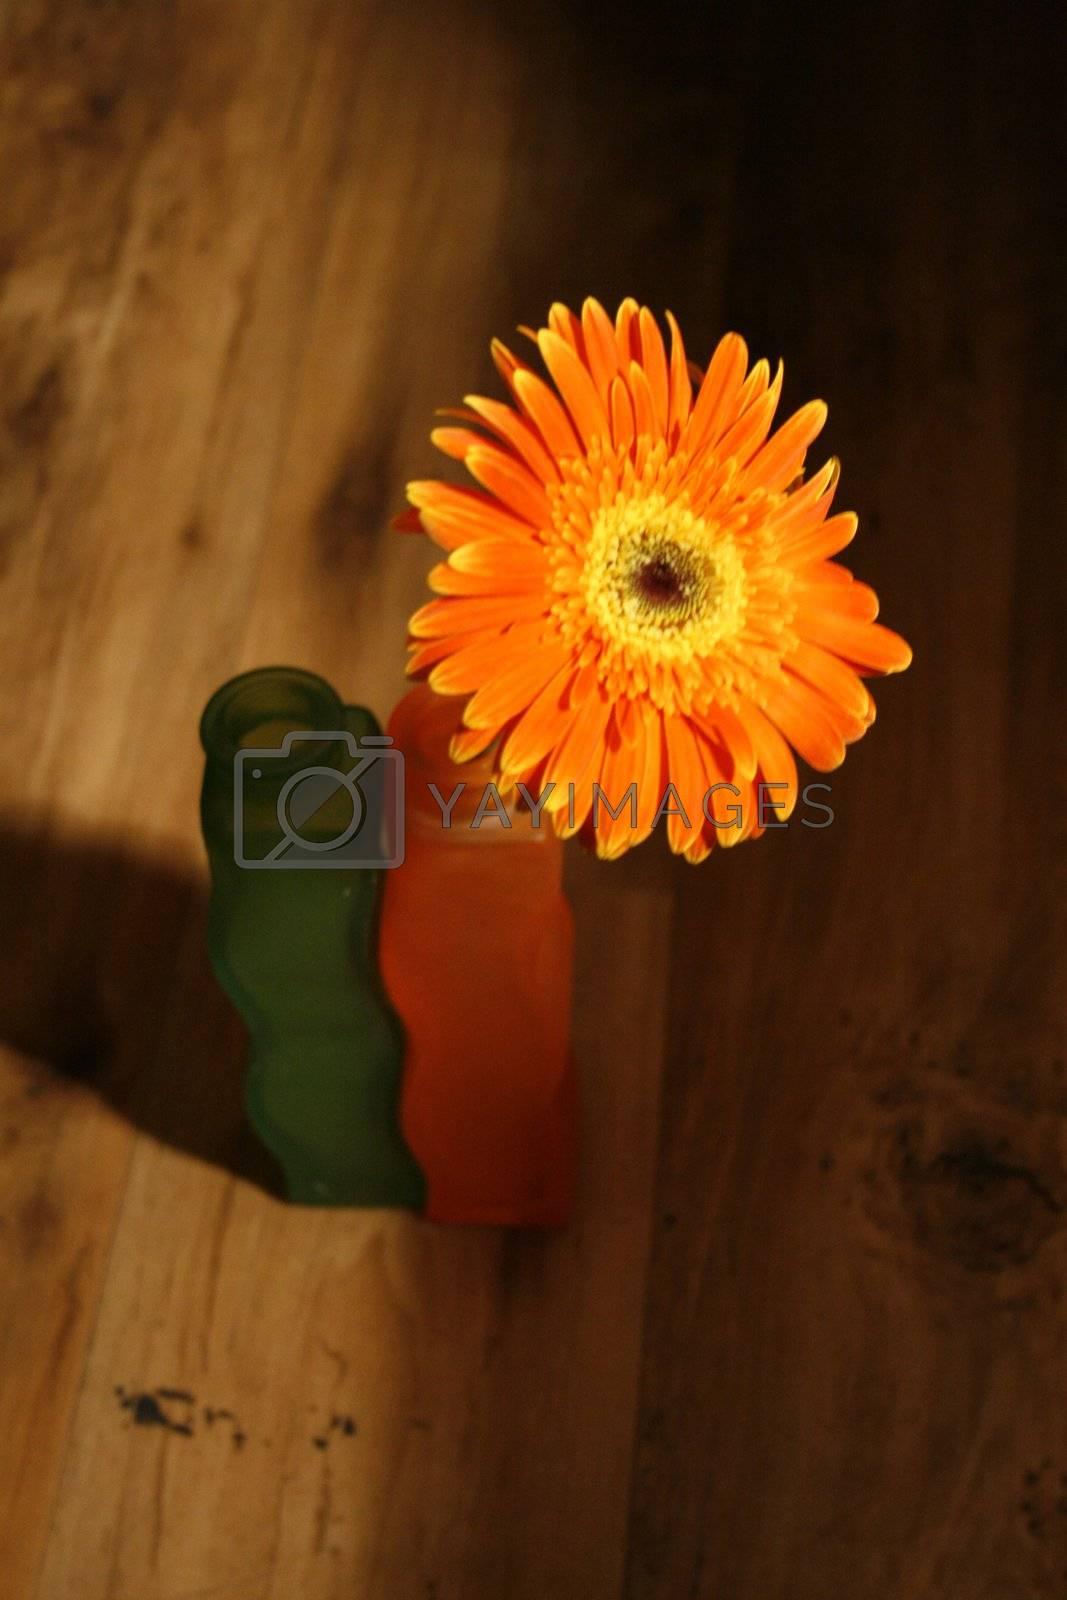 Orange flower and two vases on brown floor